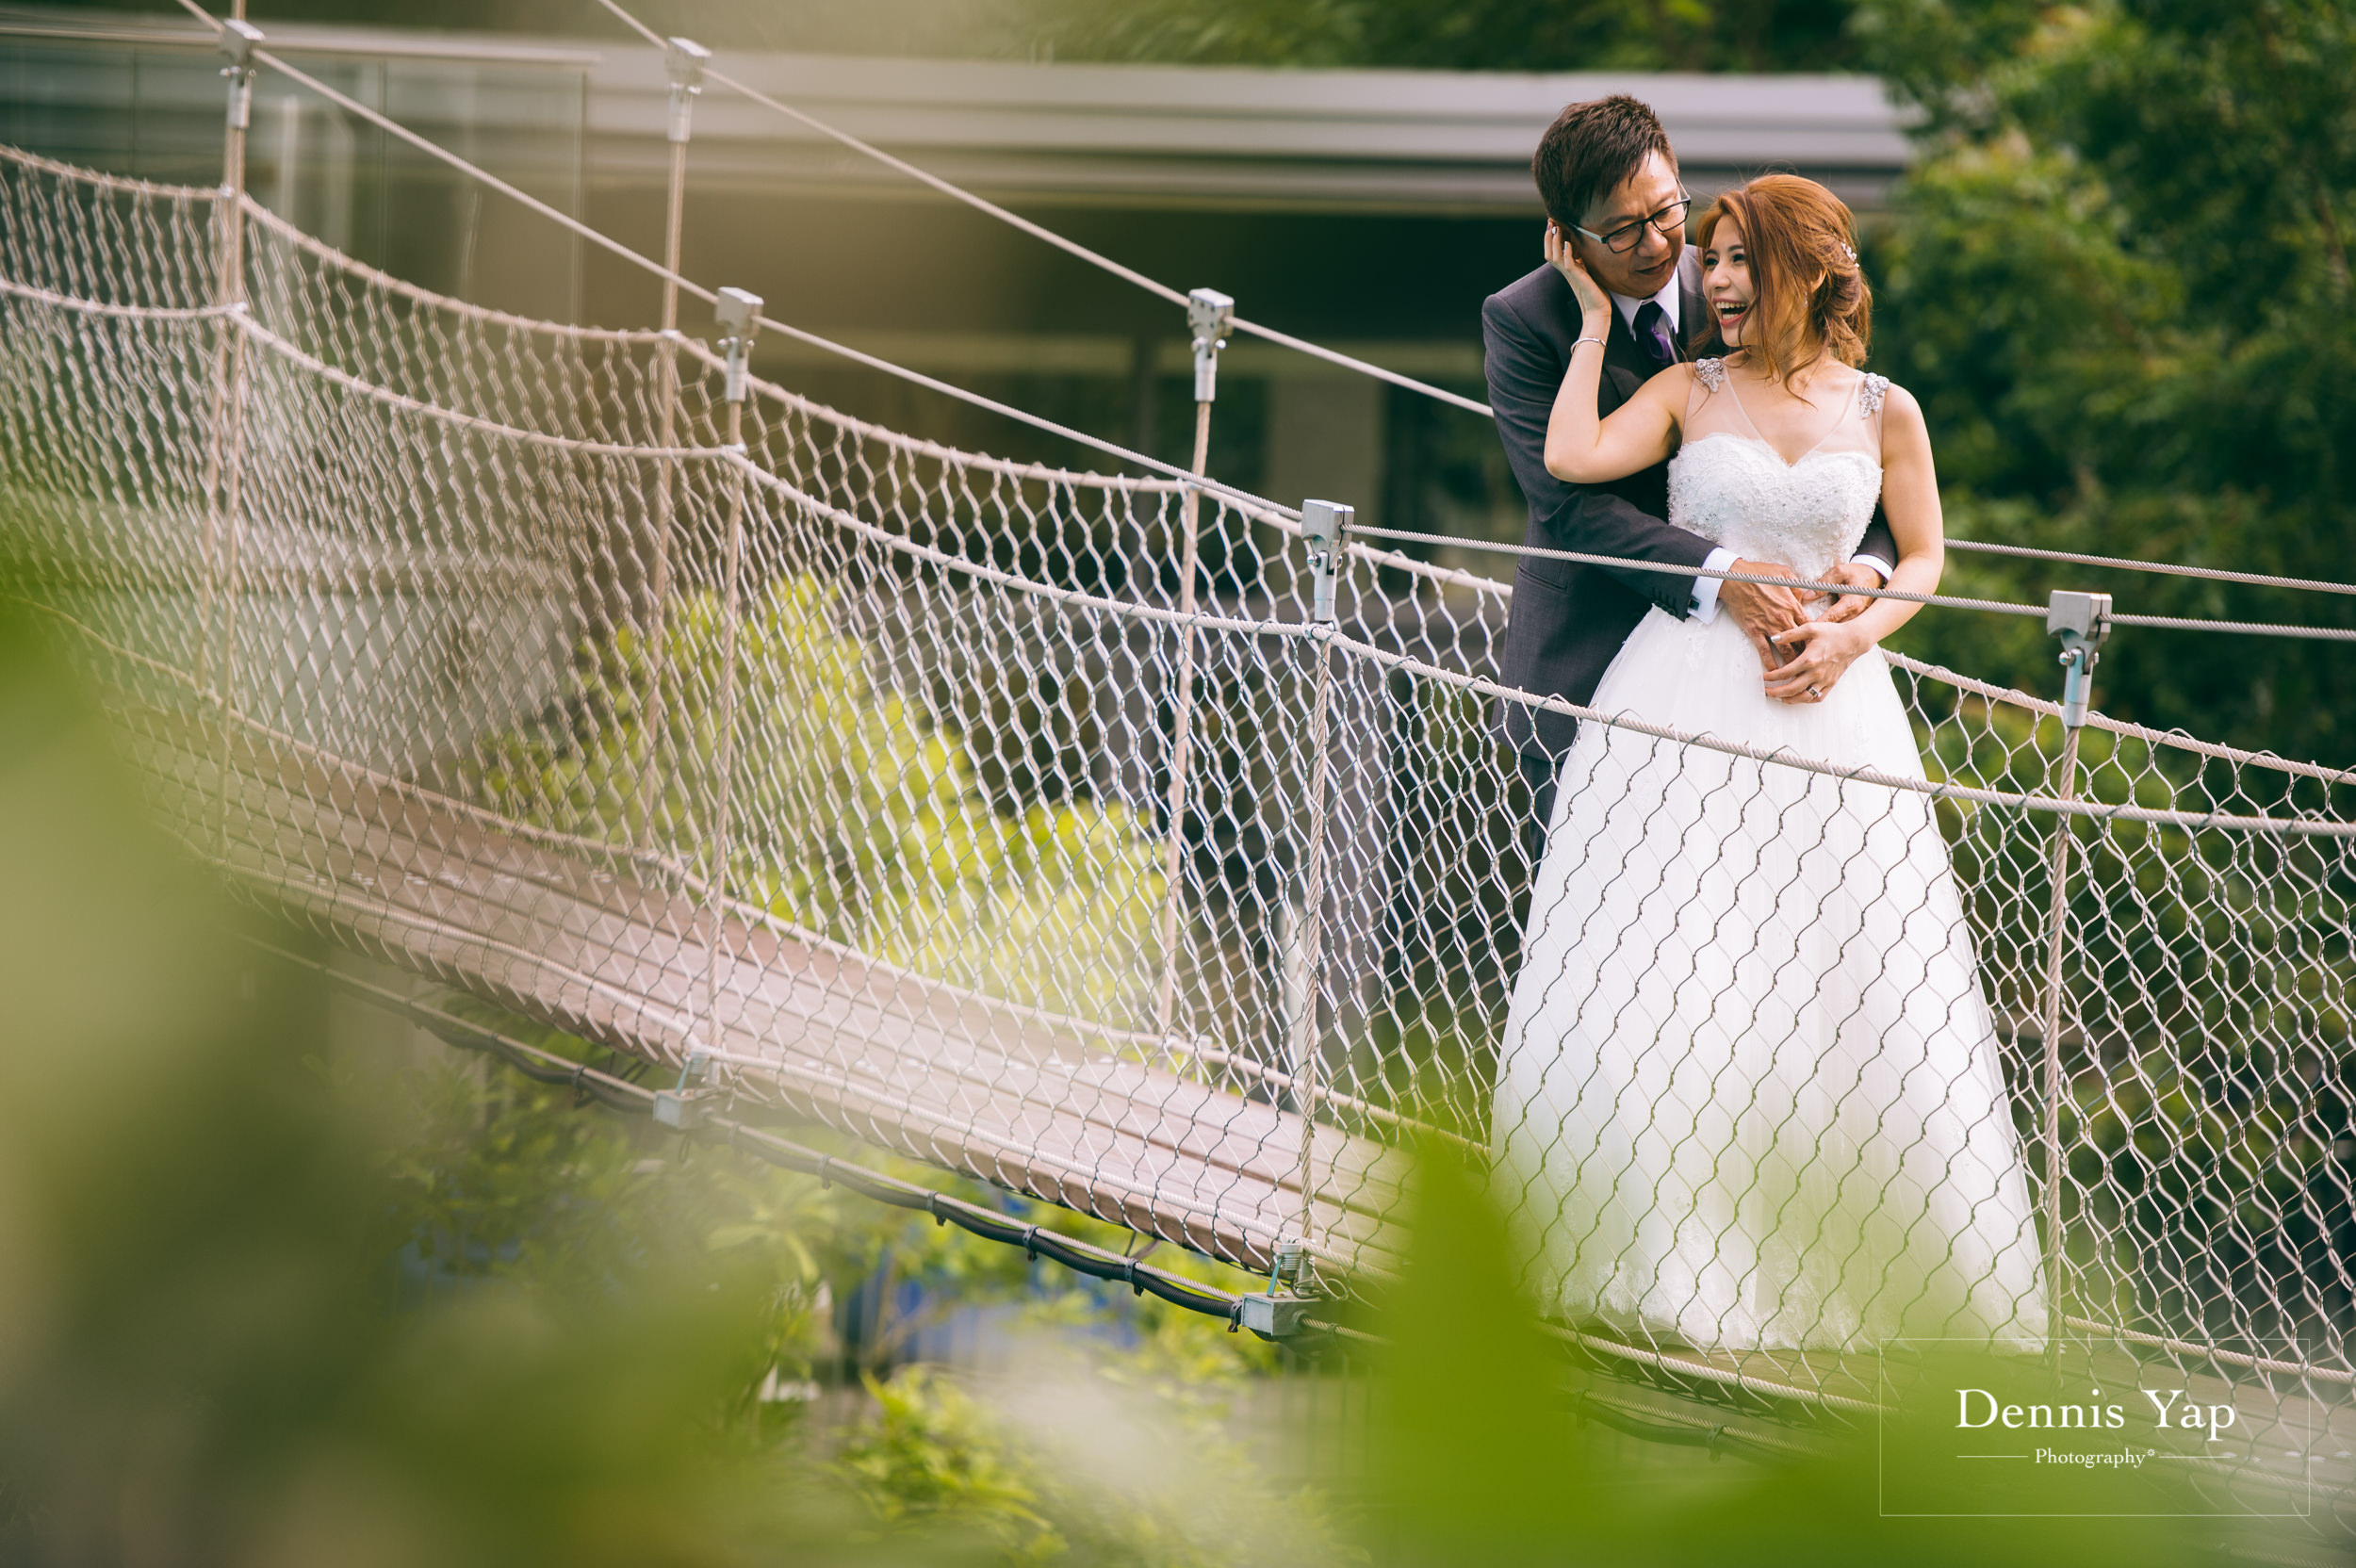 pung doris pre wedding desa park dennis yap photography-20.jpg